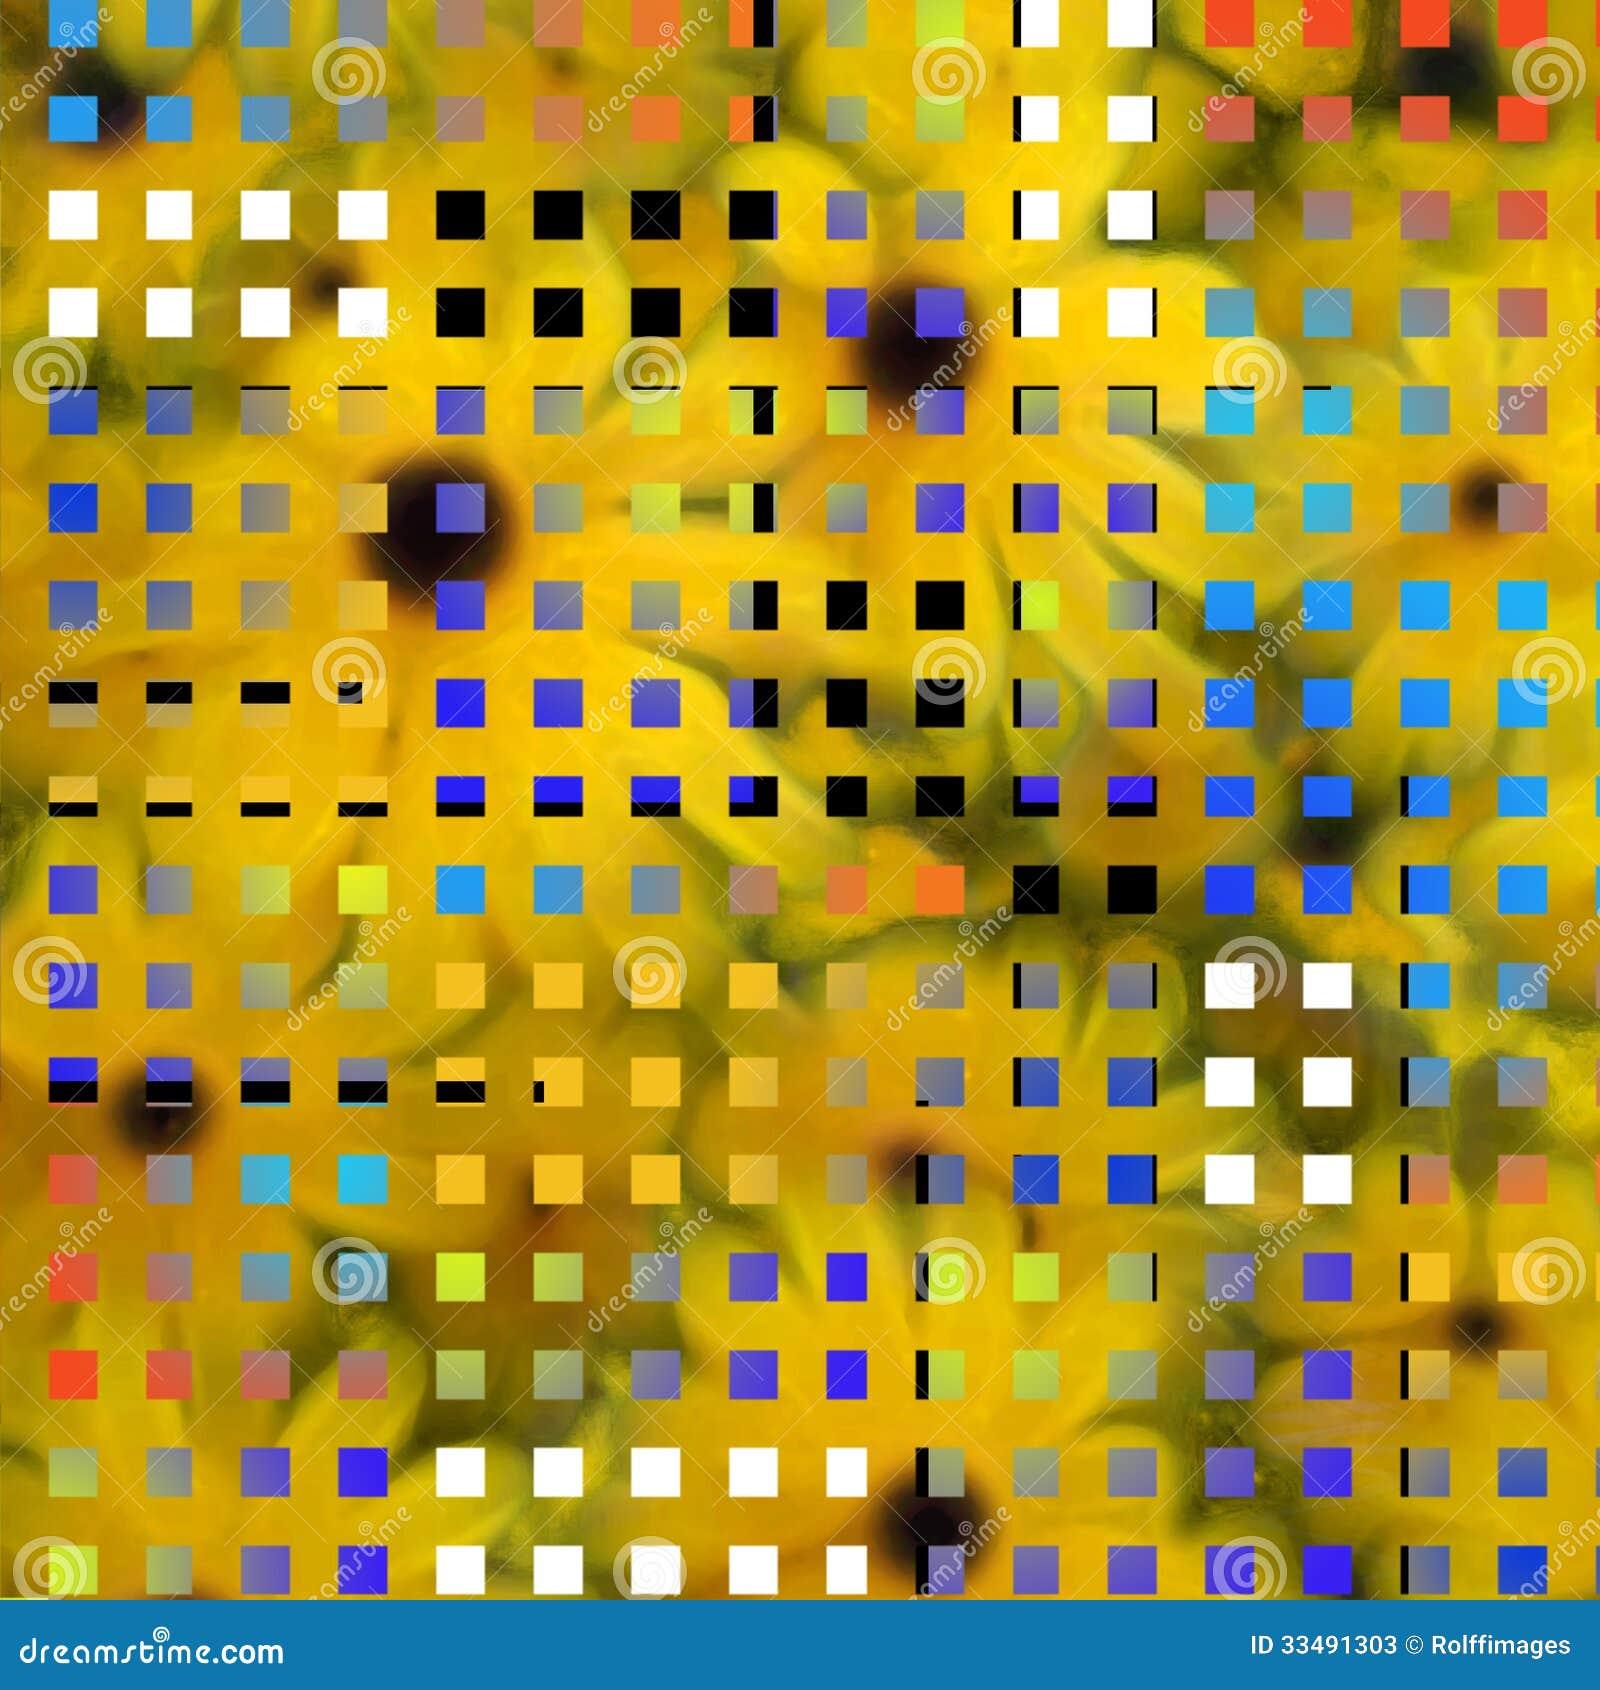 Modern art inspired composition